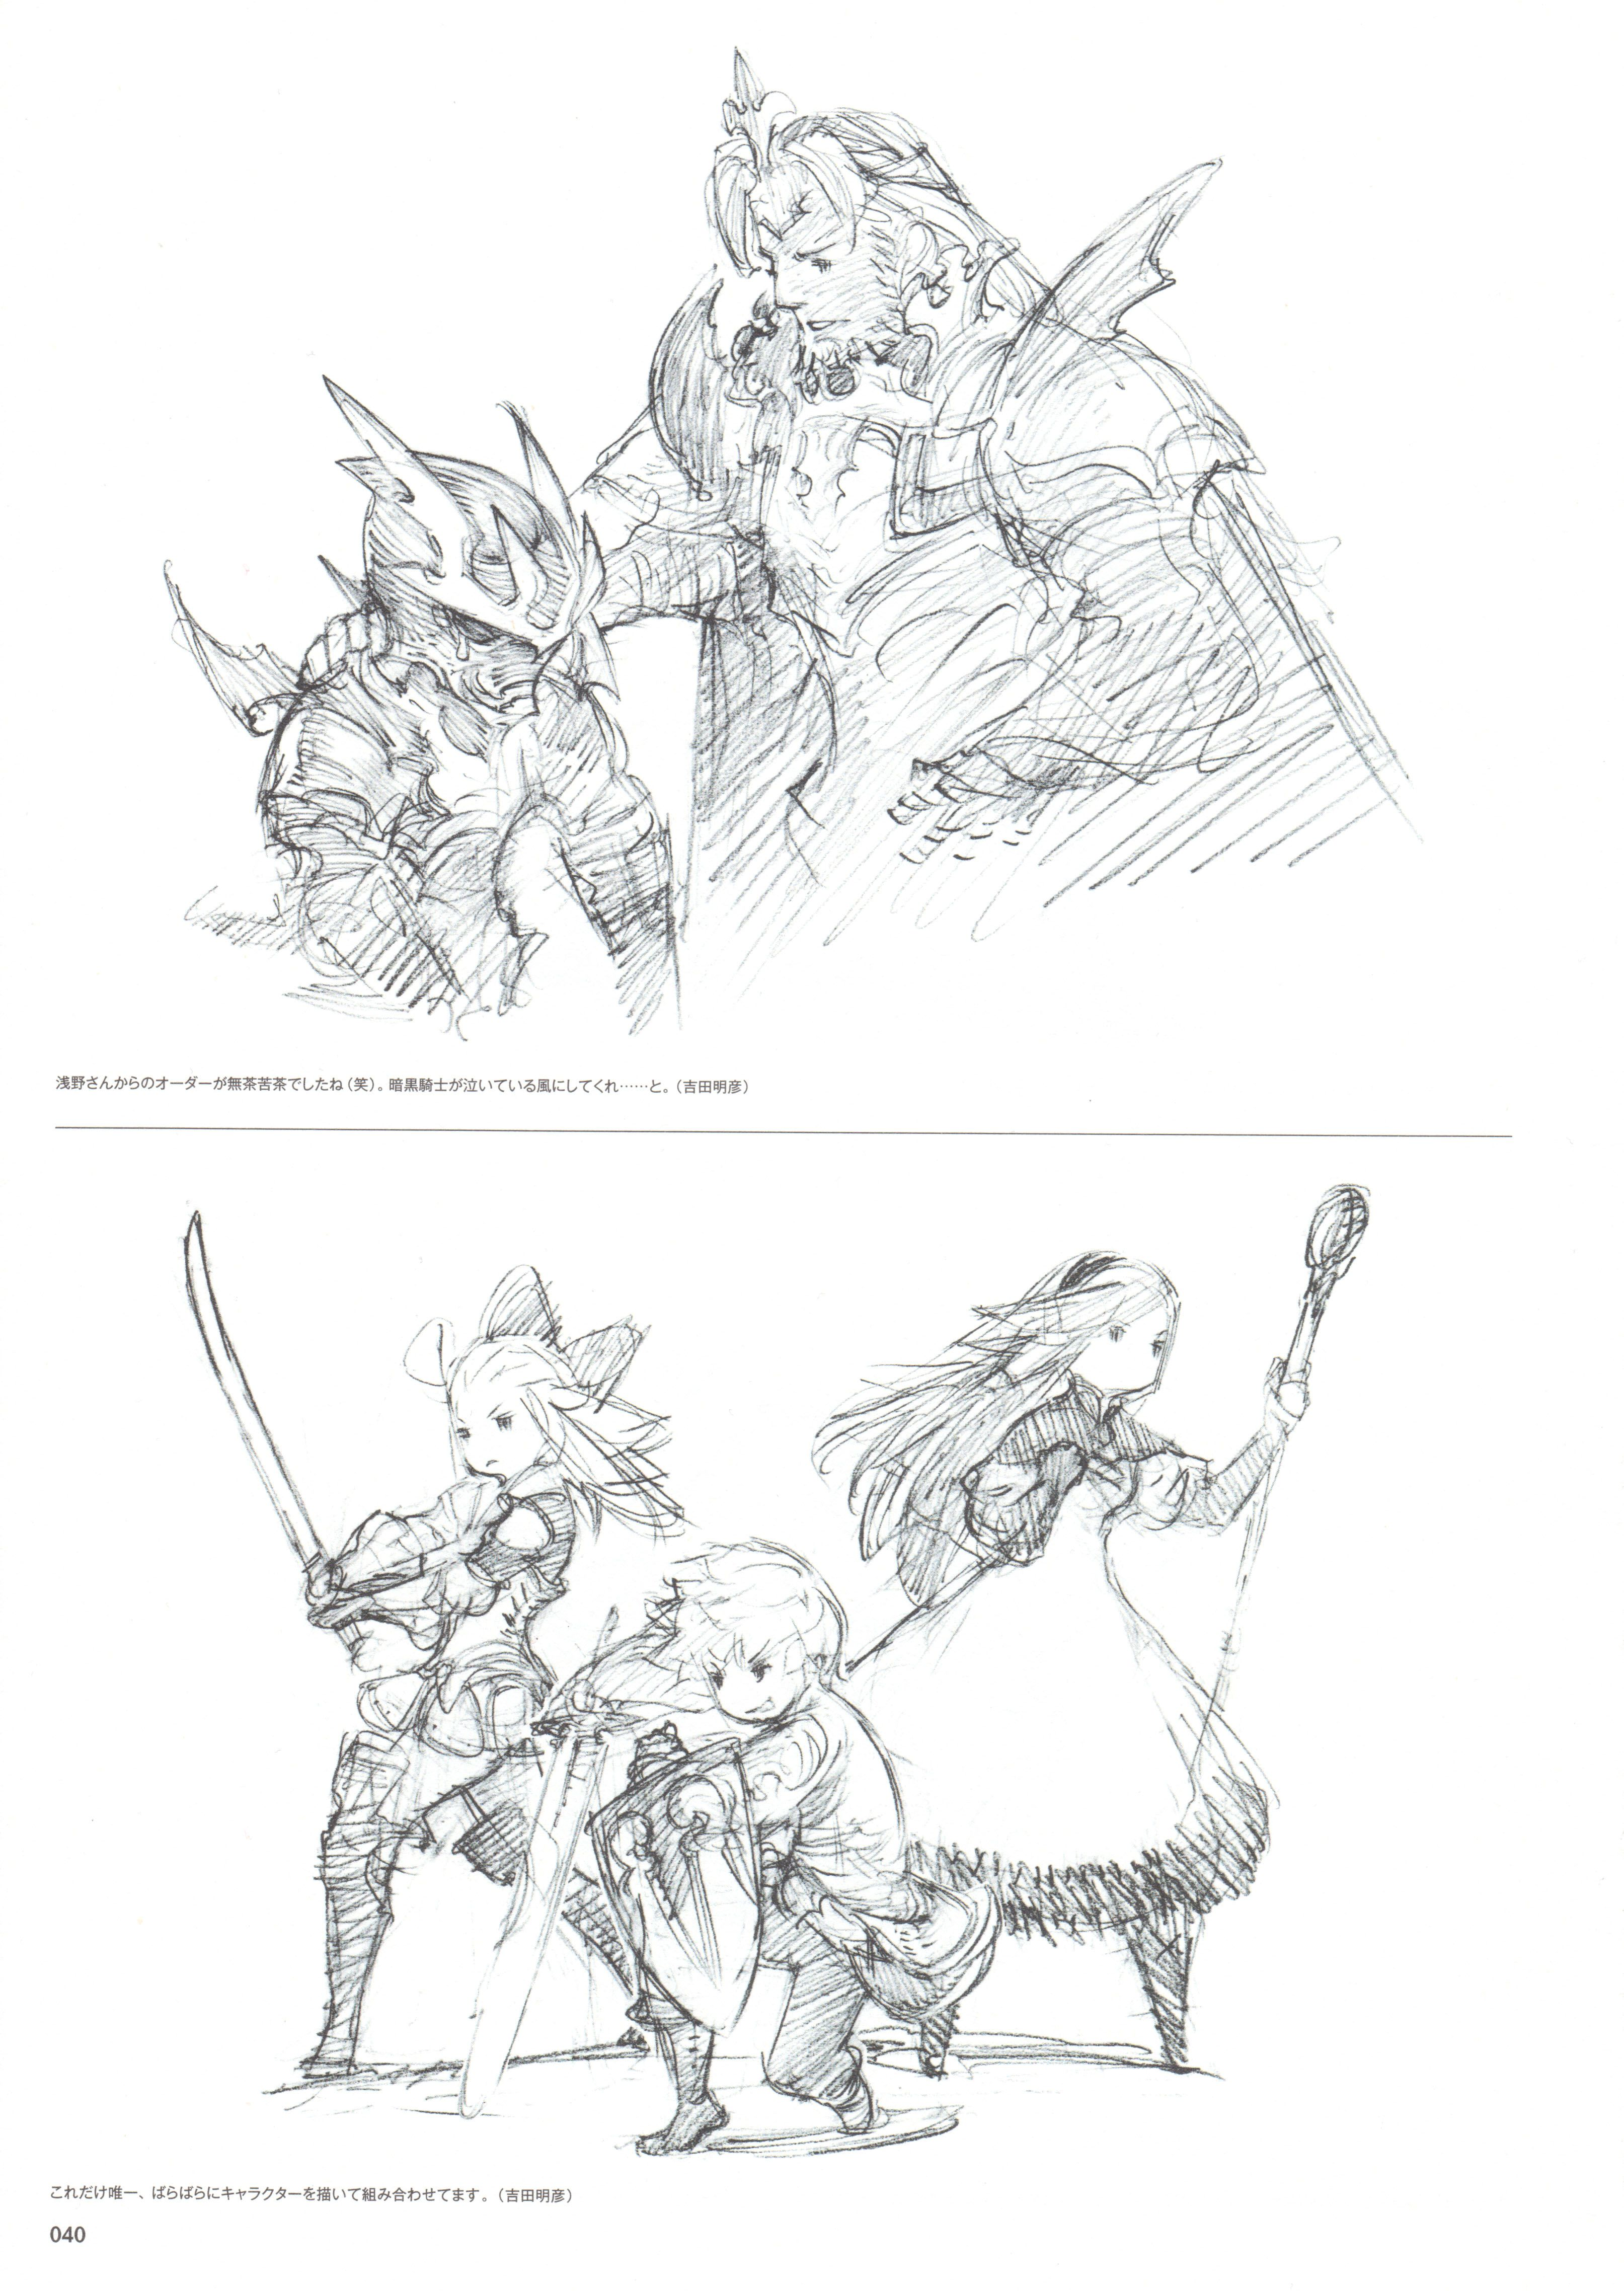 Bravely Default: Flying Fairy Image #1798843 - Zerochan Anime Image Board   吉田 明彥,厚塗り イラスト,運命の輪